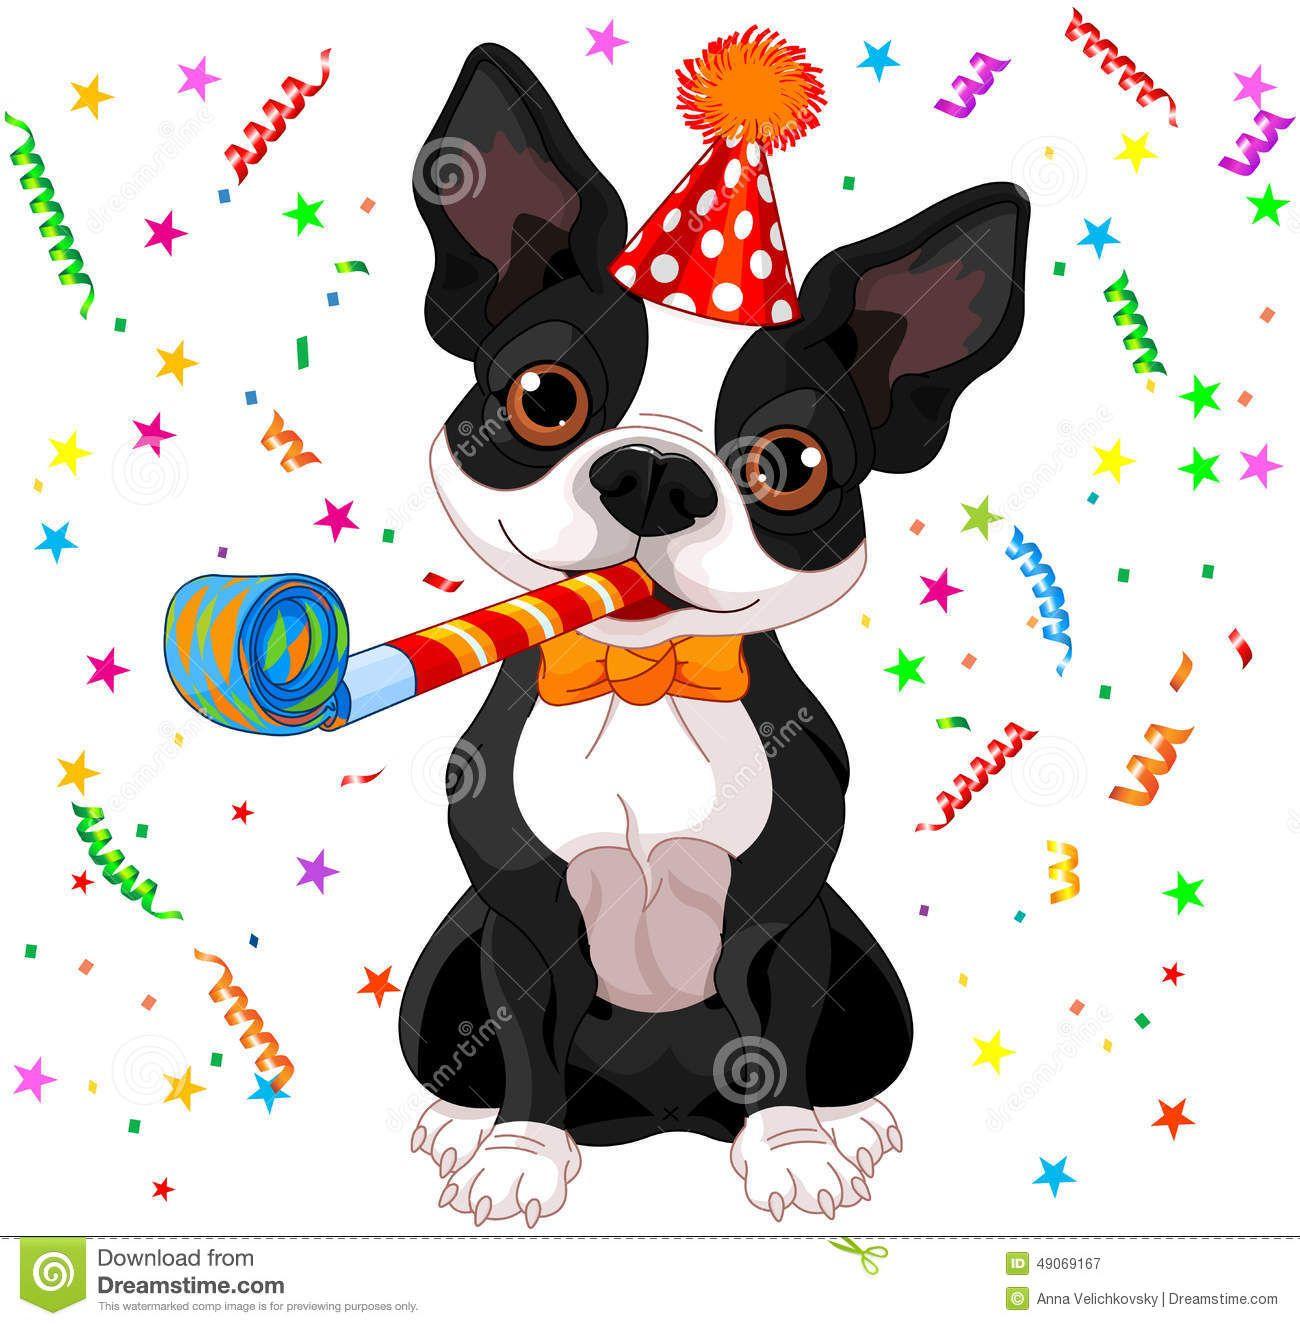 Illustration About Illustration Of Cute Boston Terrier Celebrating Illustration Of Drawing Im Happy Birthday Funny Dog Boston Terrier Dog Boston Terrier Love